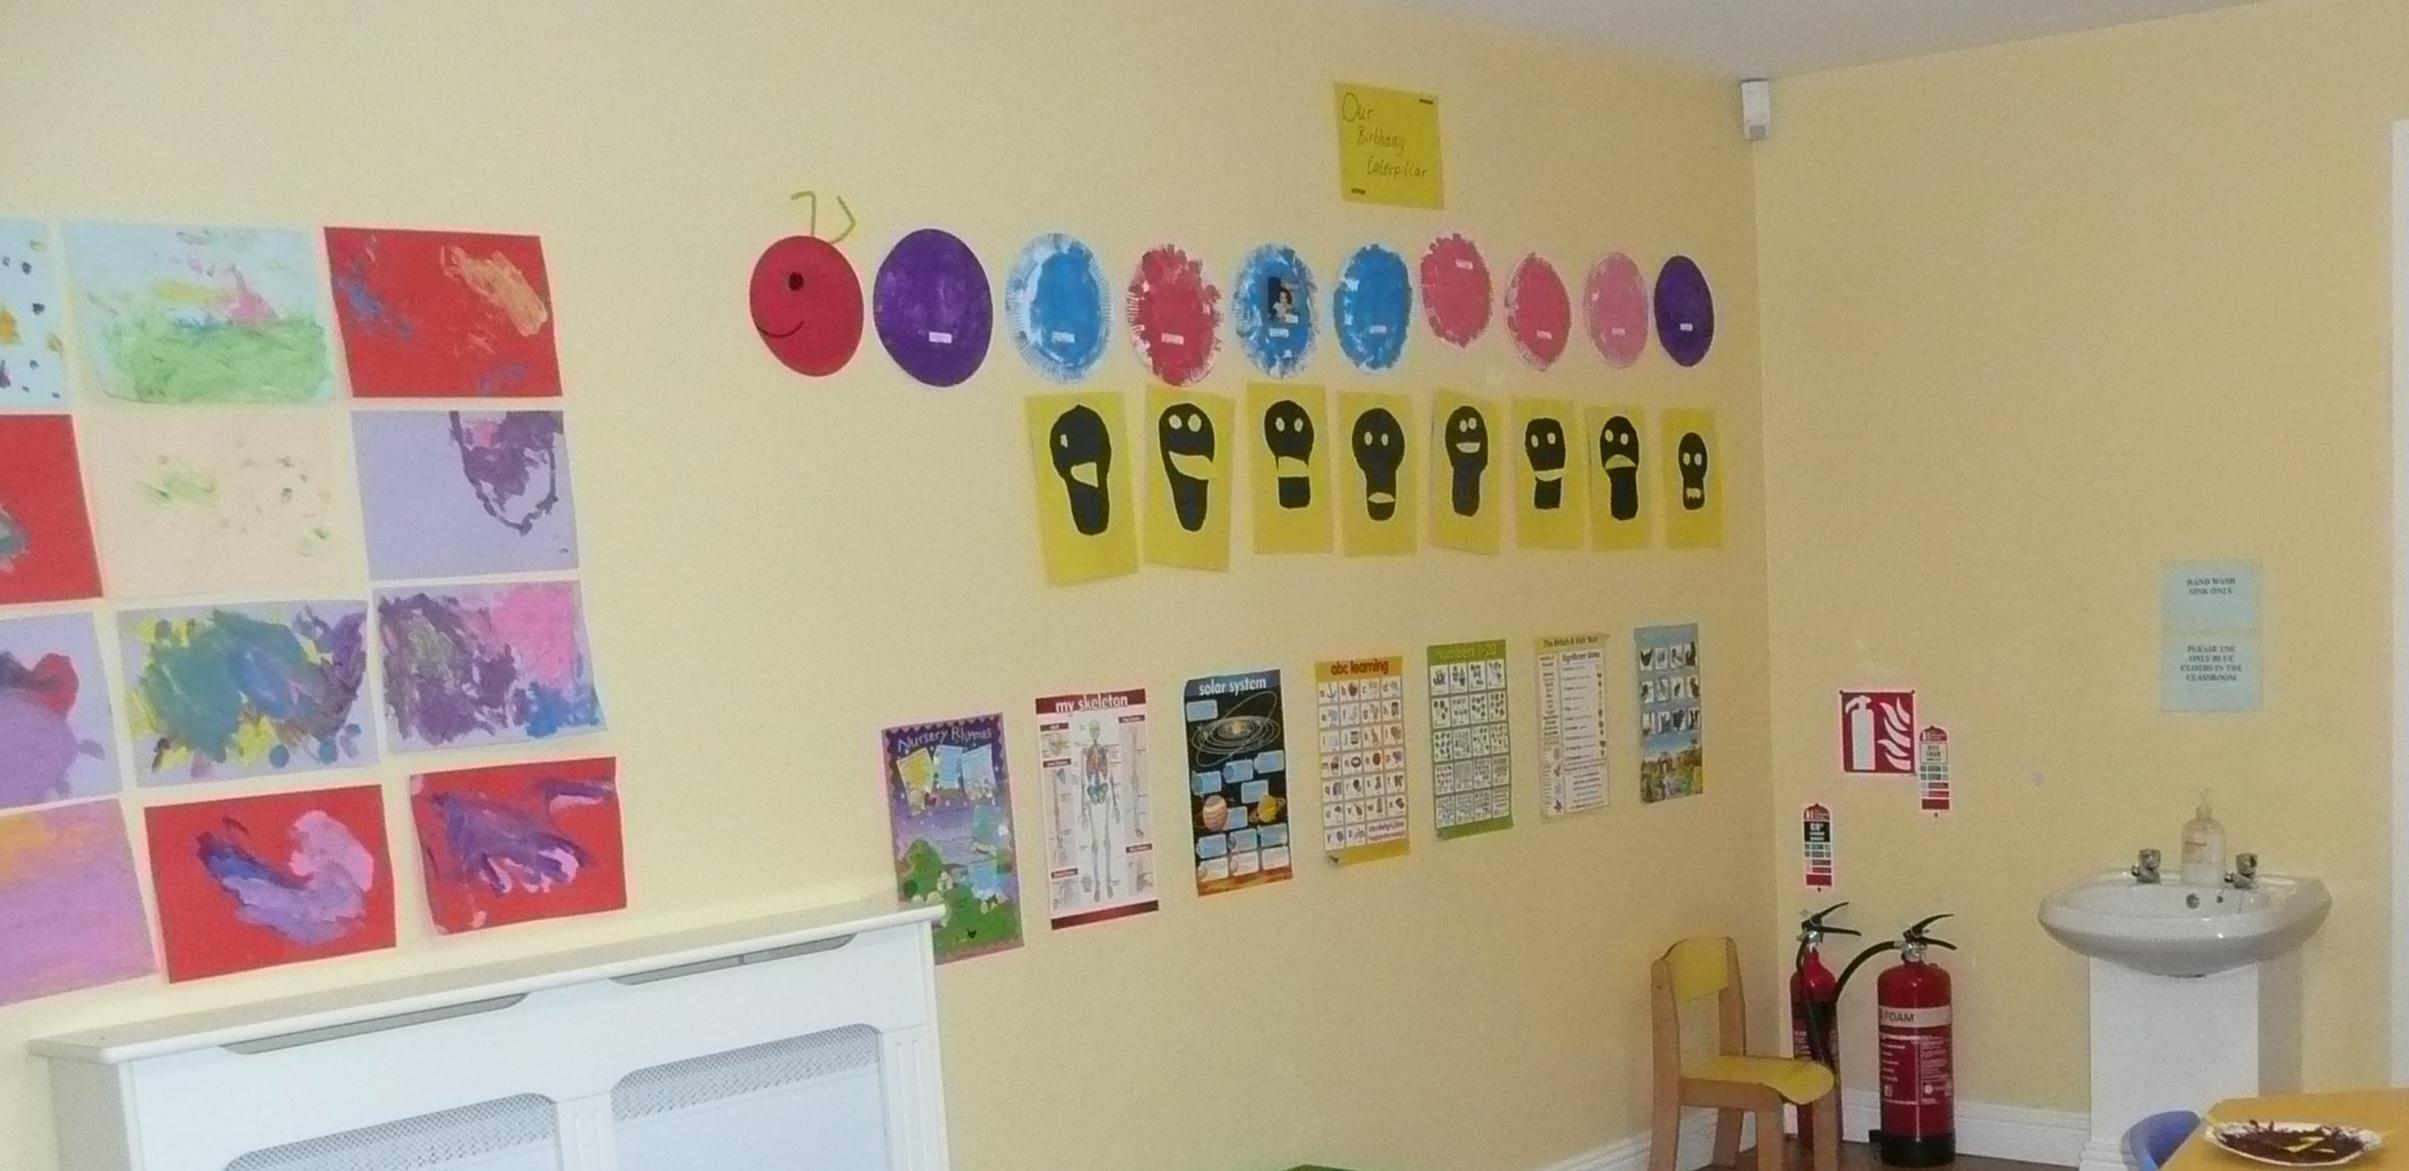 Montessori Classroom Wall Design ~ Absorbent minds pre montessori